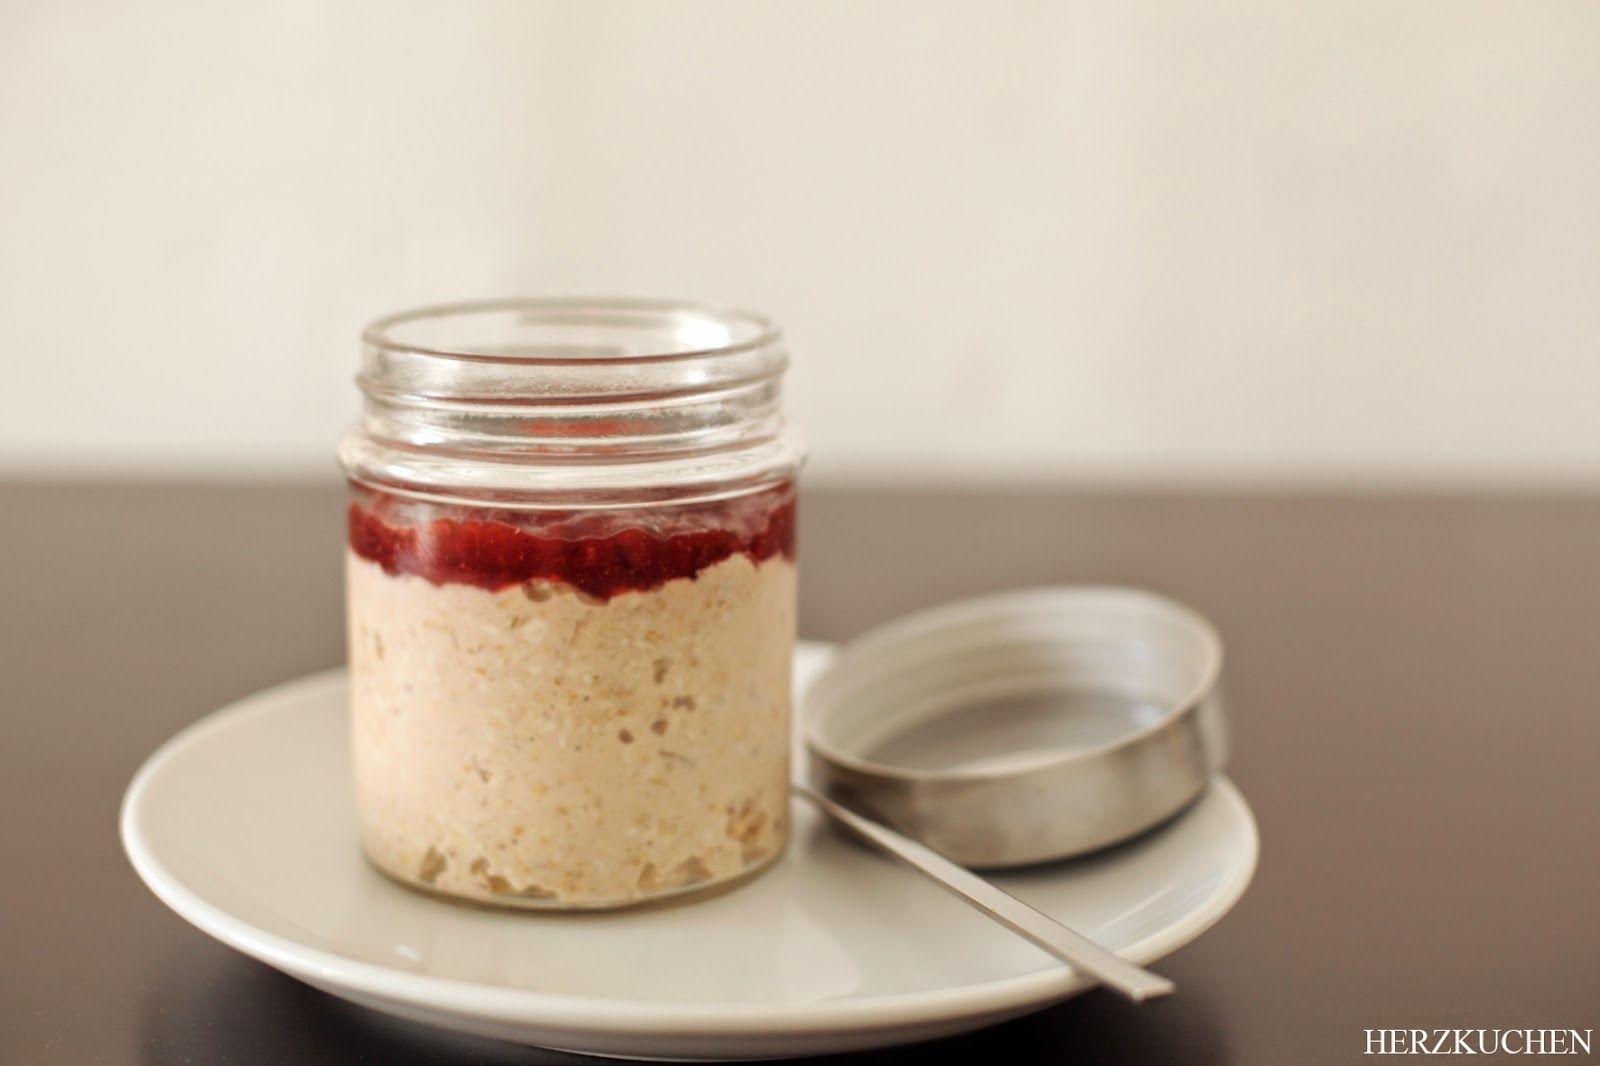 Herzkuchen: Chai Tea Overnight Oats {Breakfast Lovers #5}100 ml of hot water  1 bag Chai Tea  90 g oatmeal  80 ml milk  1 tsp cane sugar  1/2 tsp cinnamon